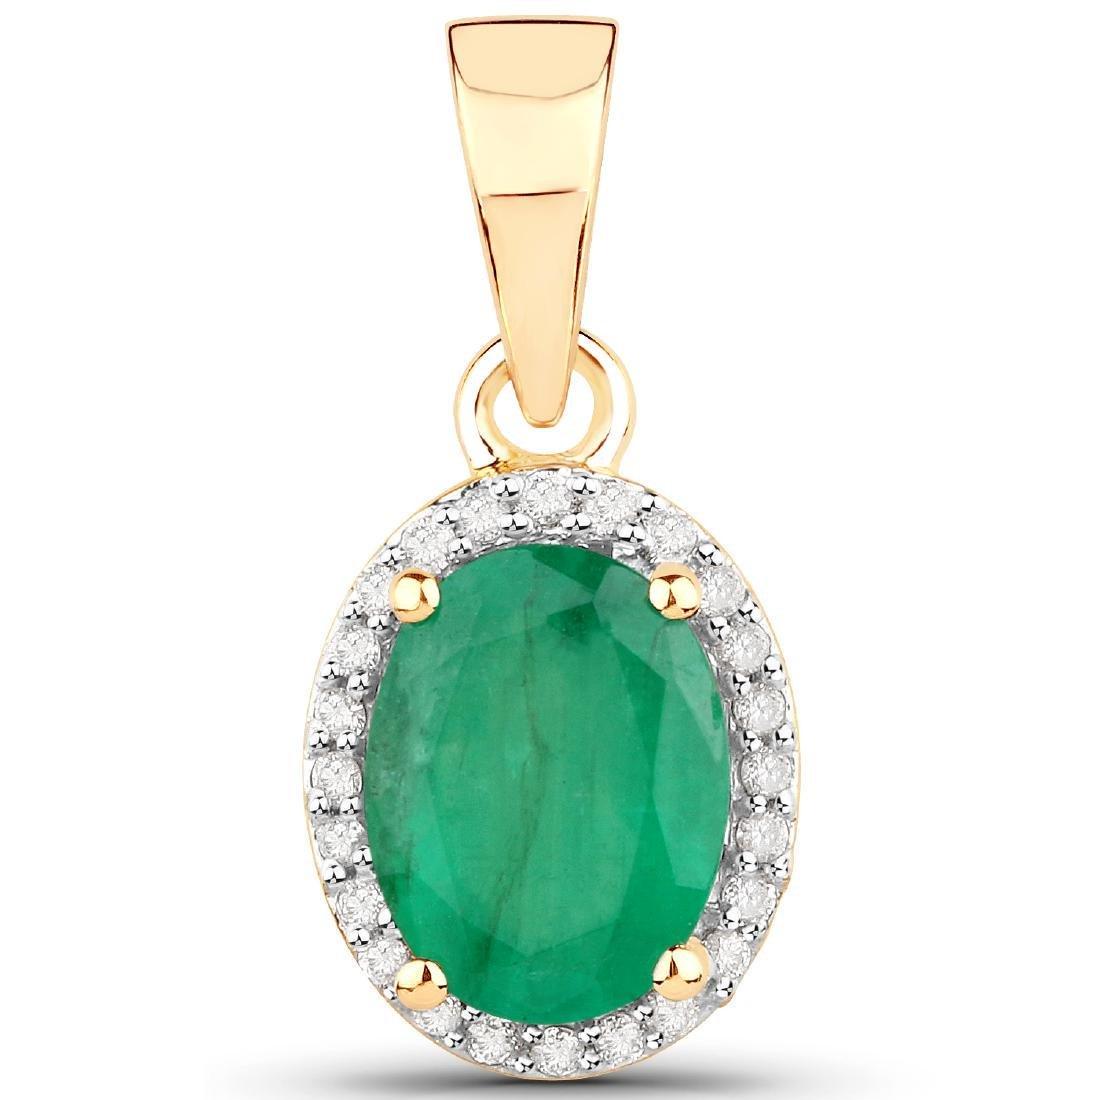 1.35 Carat Genuine Zambian Emerald and White Diamond